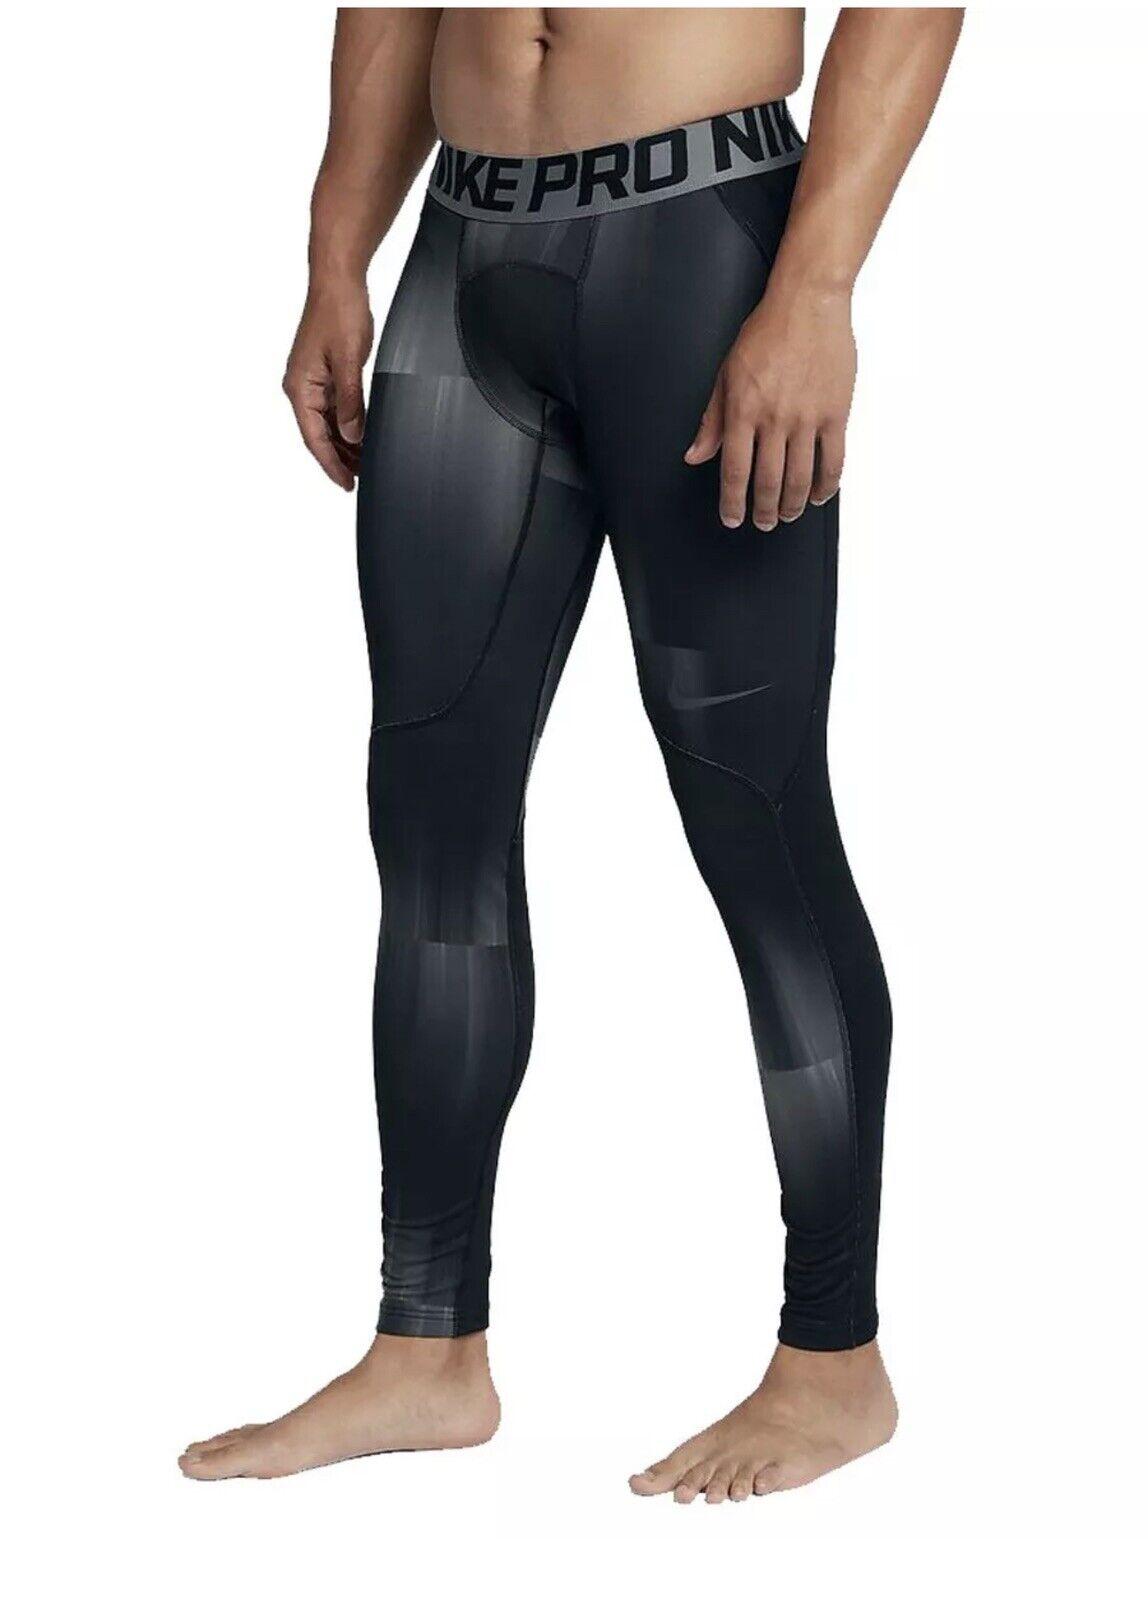 Nike Pro Men's  Size M & XL  Hyperwarm Printed Training Tights 801986-060 NWT  fitness retailer